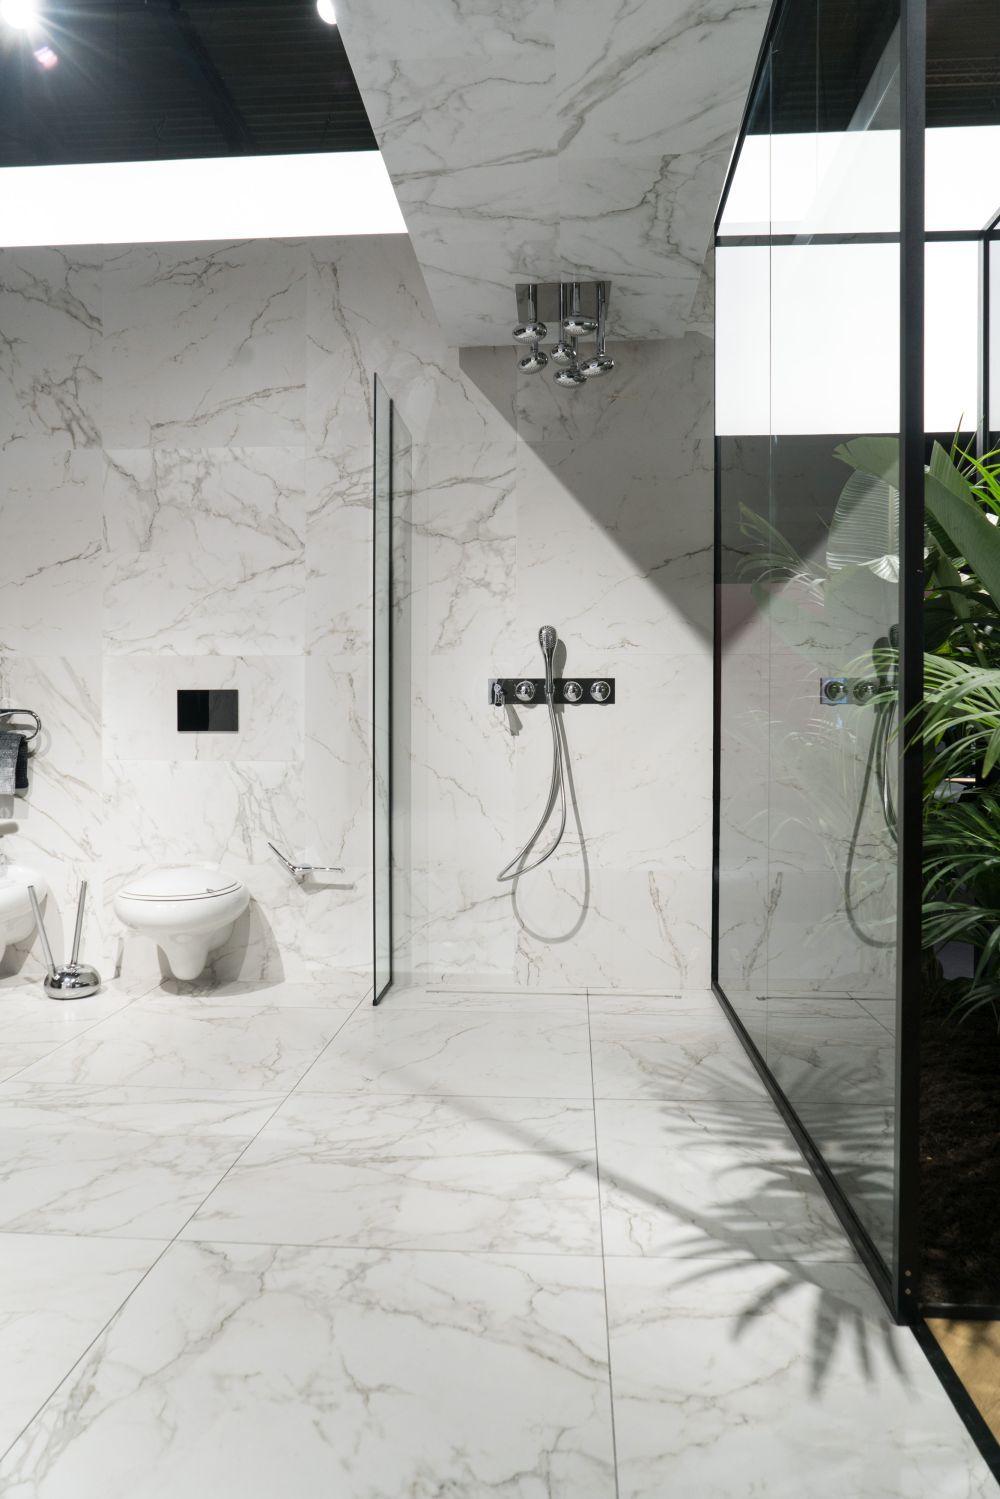 The Best Ways To Use Carrara Marble In Interior Design Modern Shower Design Bathroom Inspiration Decor Modern Bathroom Decor Bathroom ideas carrara marble